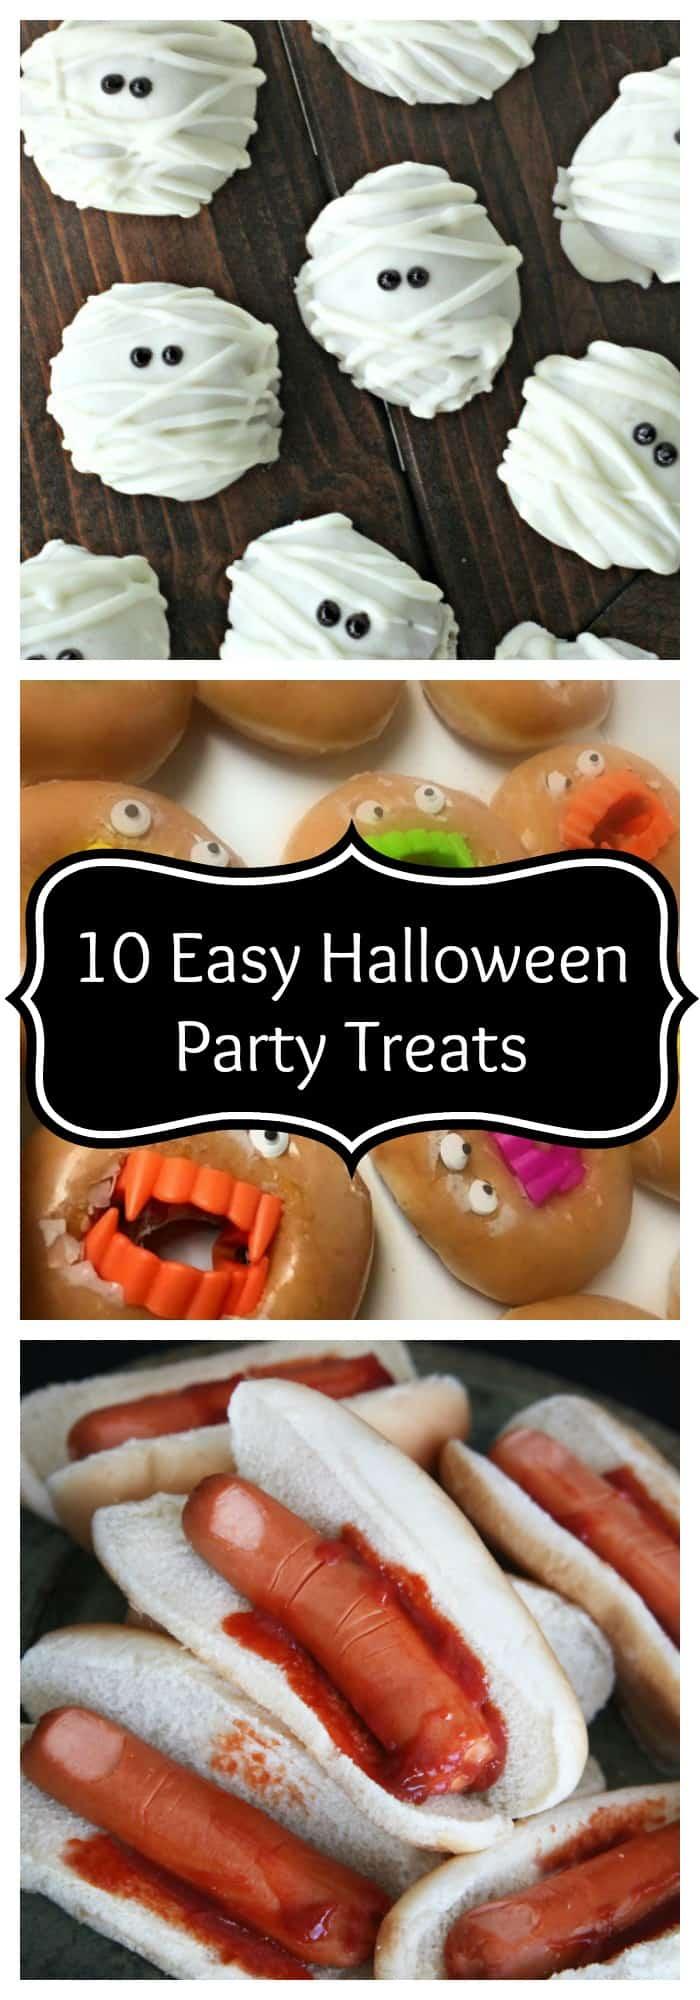 halloween 10 easy halloween party treats the organized mom